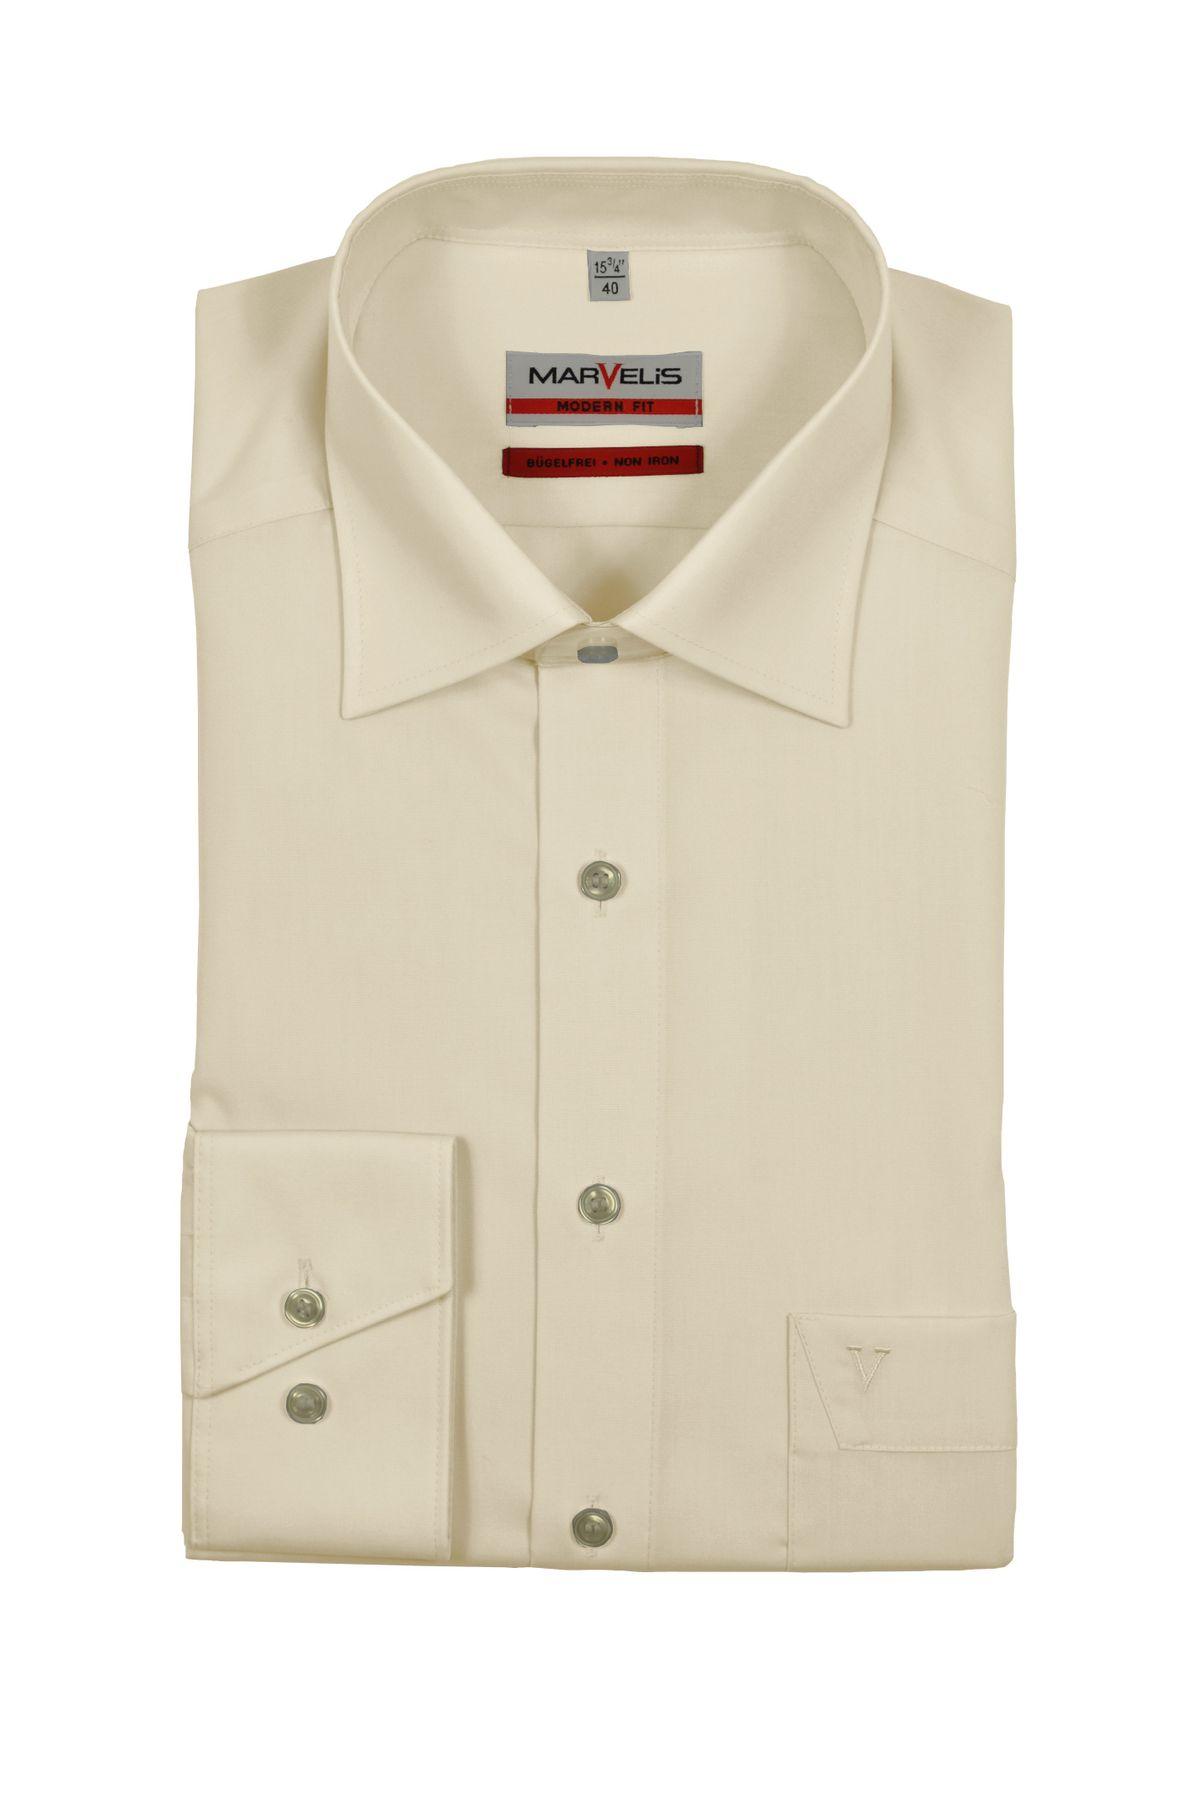 Marvelis - Modern Fit - Herren Langarm Hemd in verschiedenen Farben, Bügelfrei (4700/64) – Bild 4